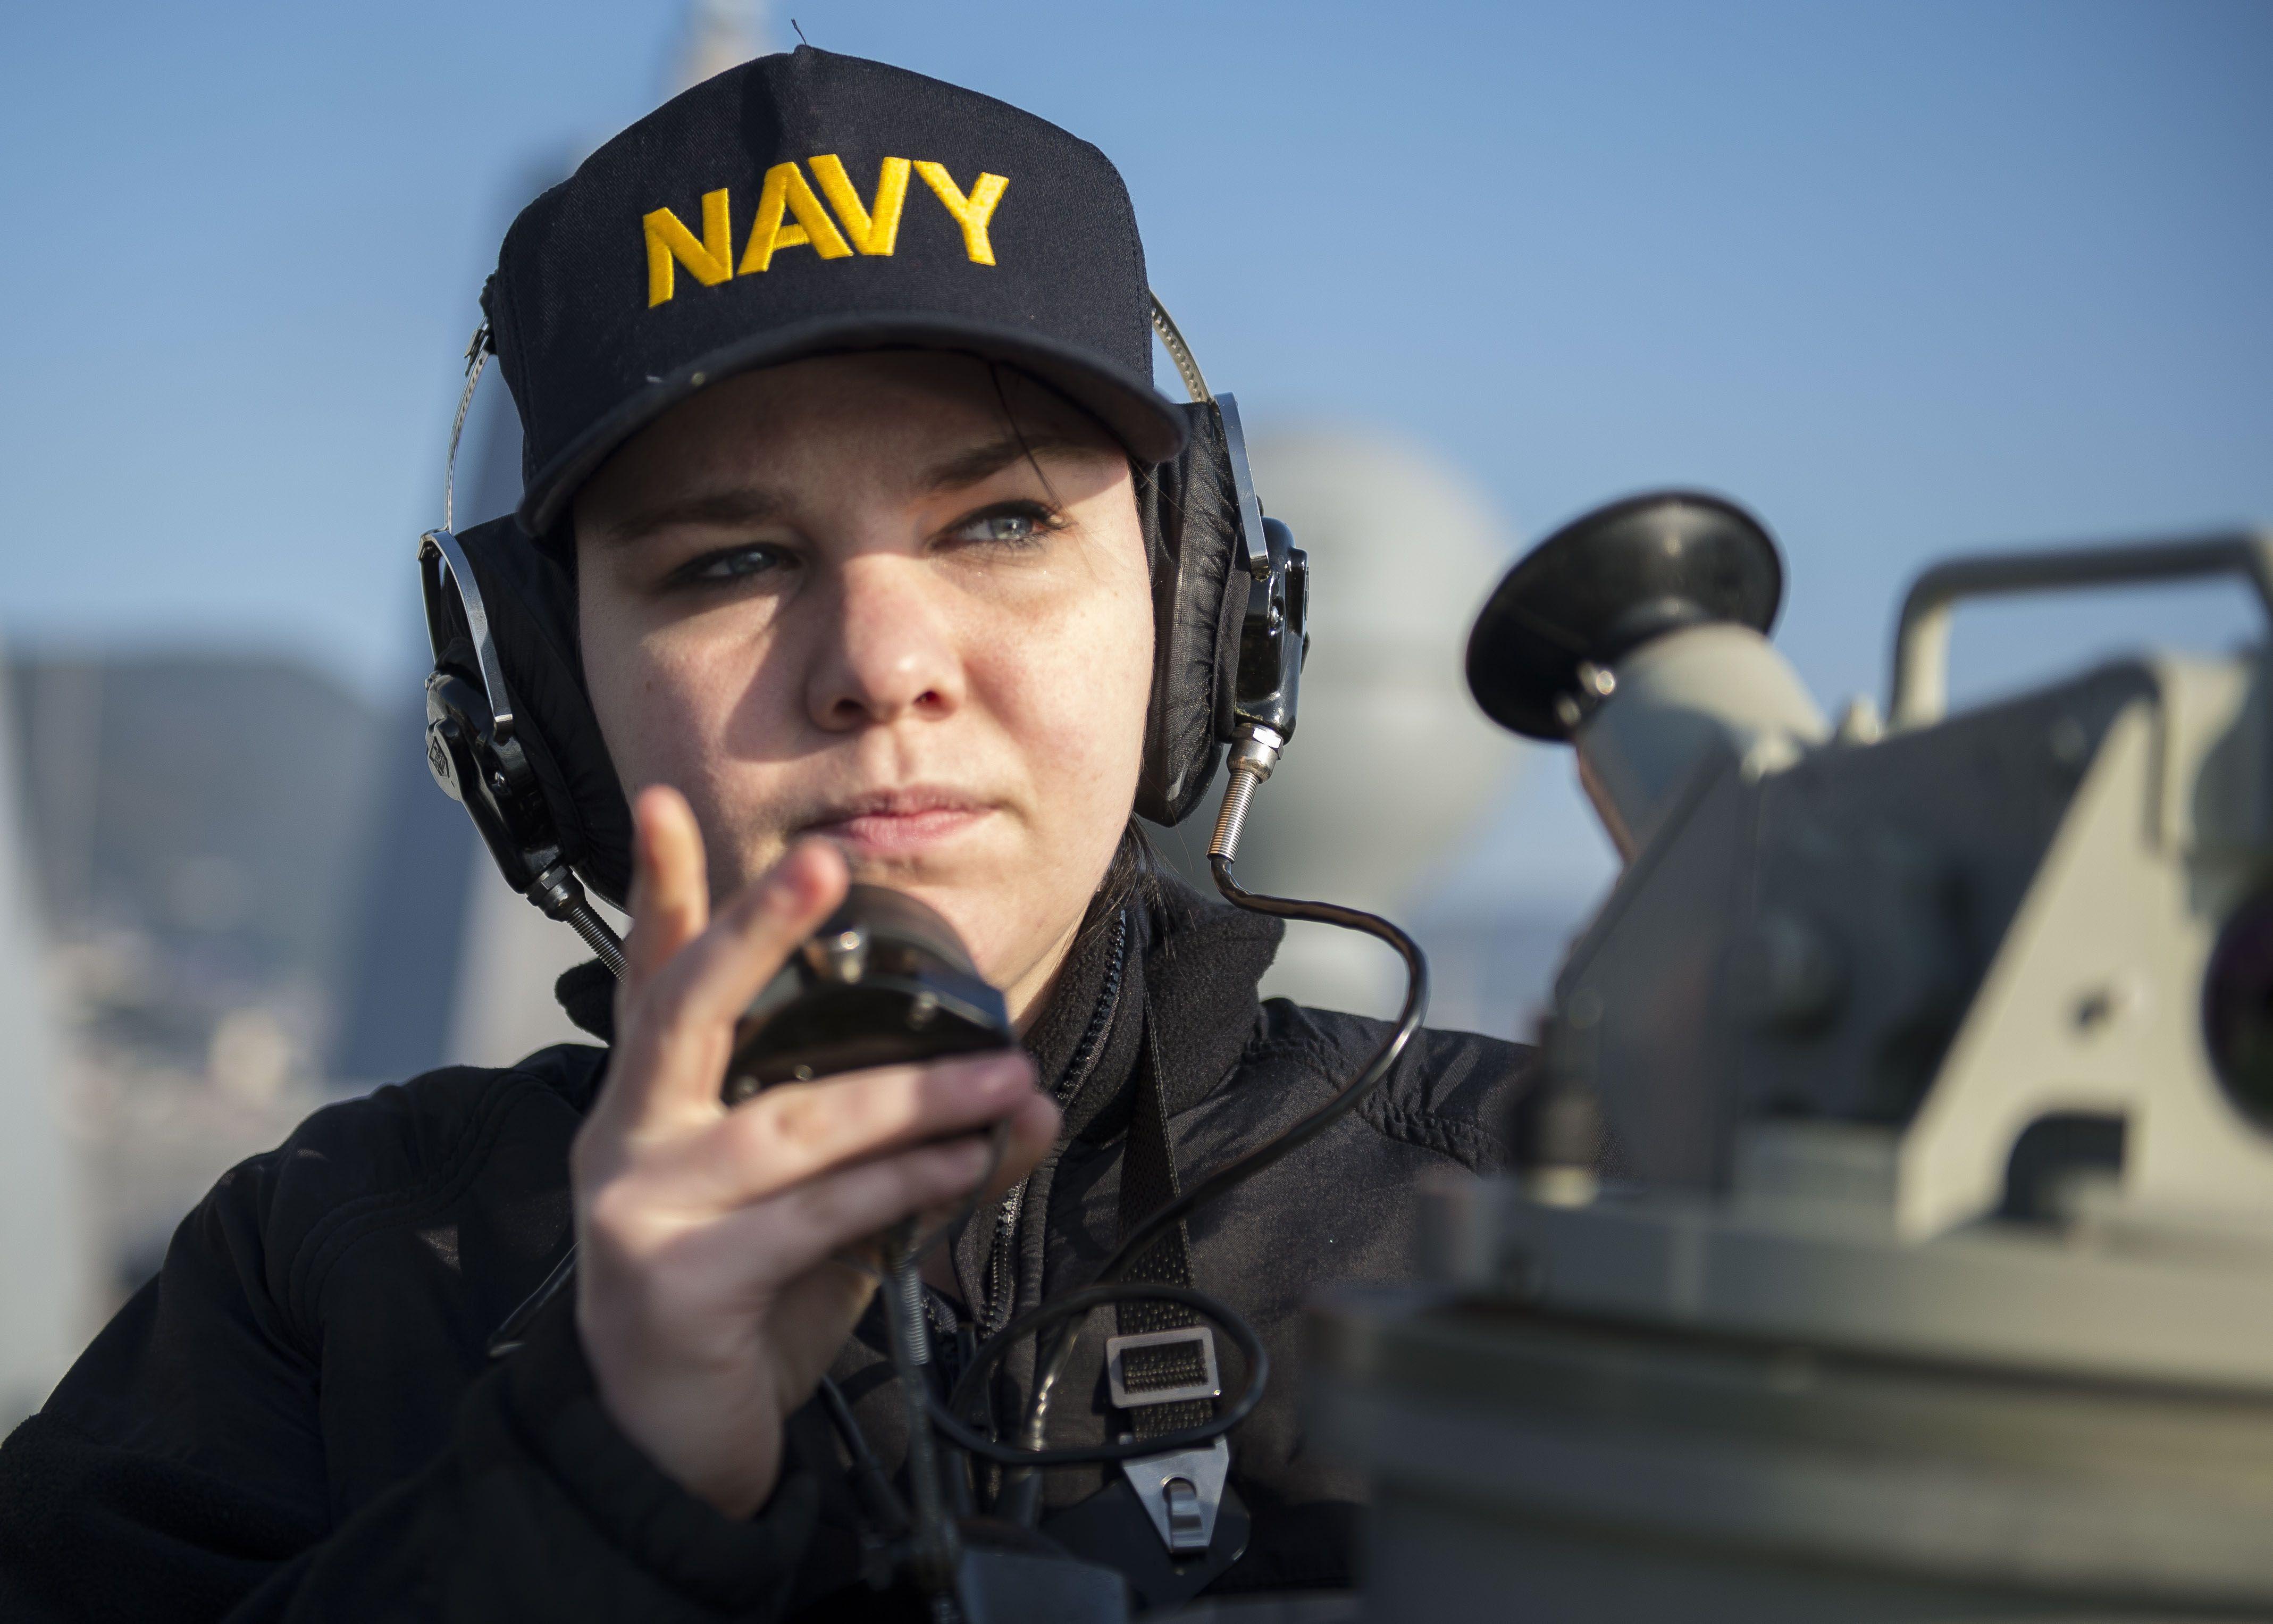 quartermaster seaman savannah williams relays bearings aboard the amphibious transport dock ship uss green bay